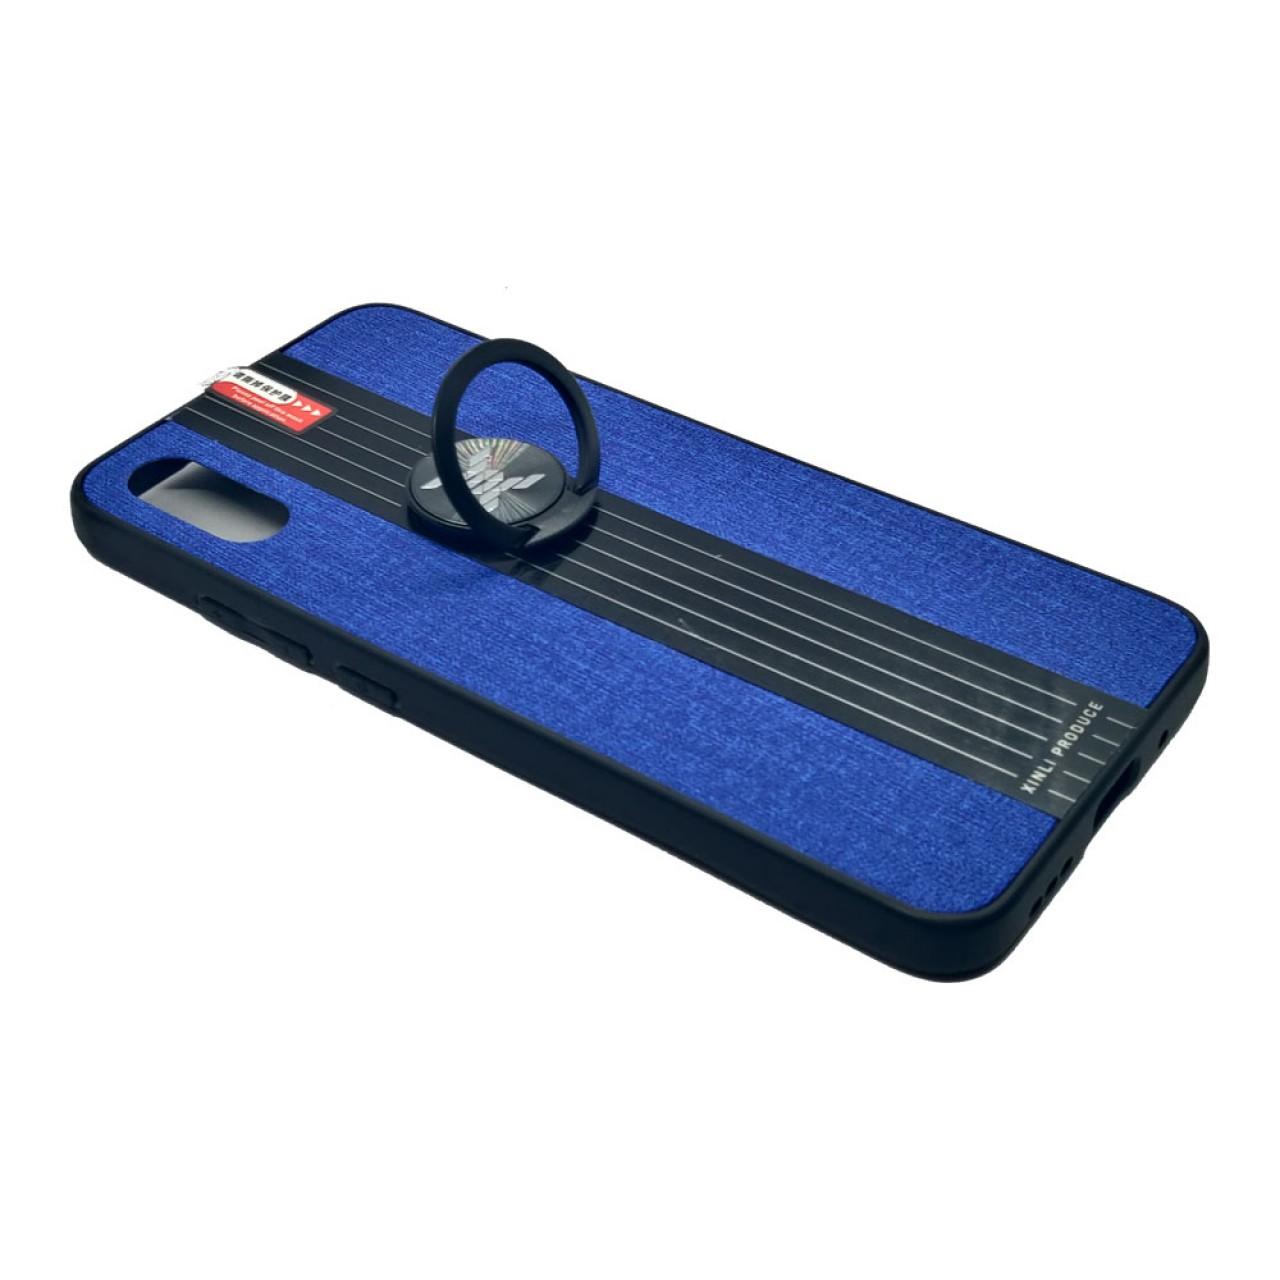 Back Case Cloth Pattern with ring Blue for Redmi 9A - Θήκη προστασίας με δαχτυλίδι στην πλάτη Μπλε - OEM